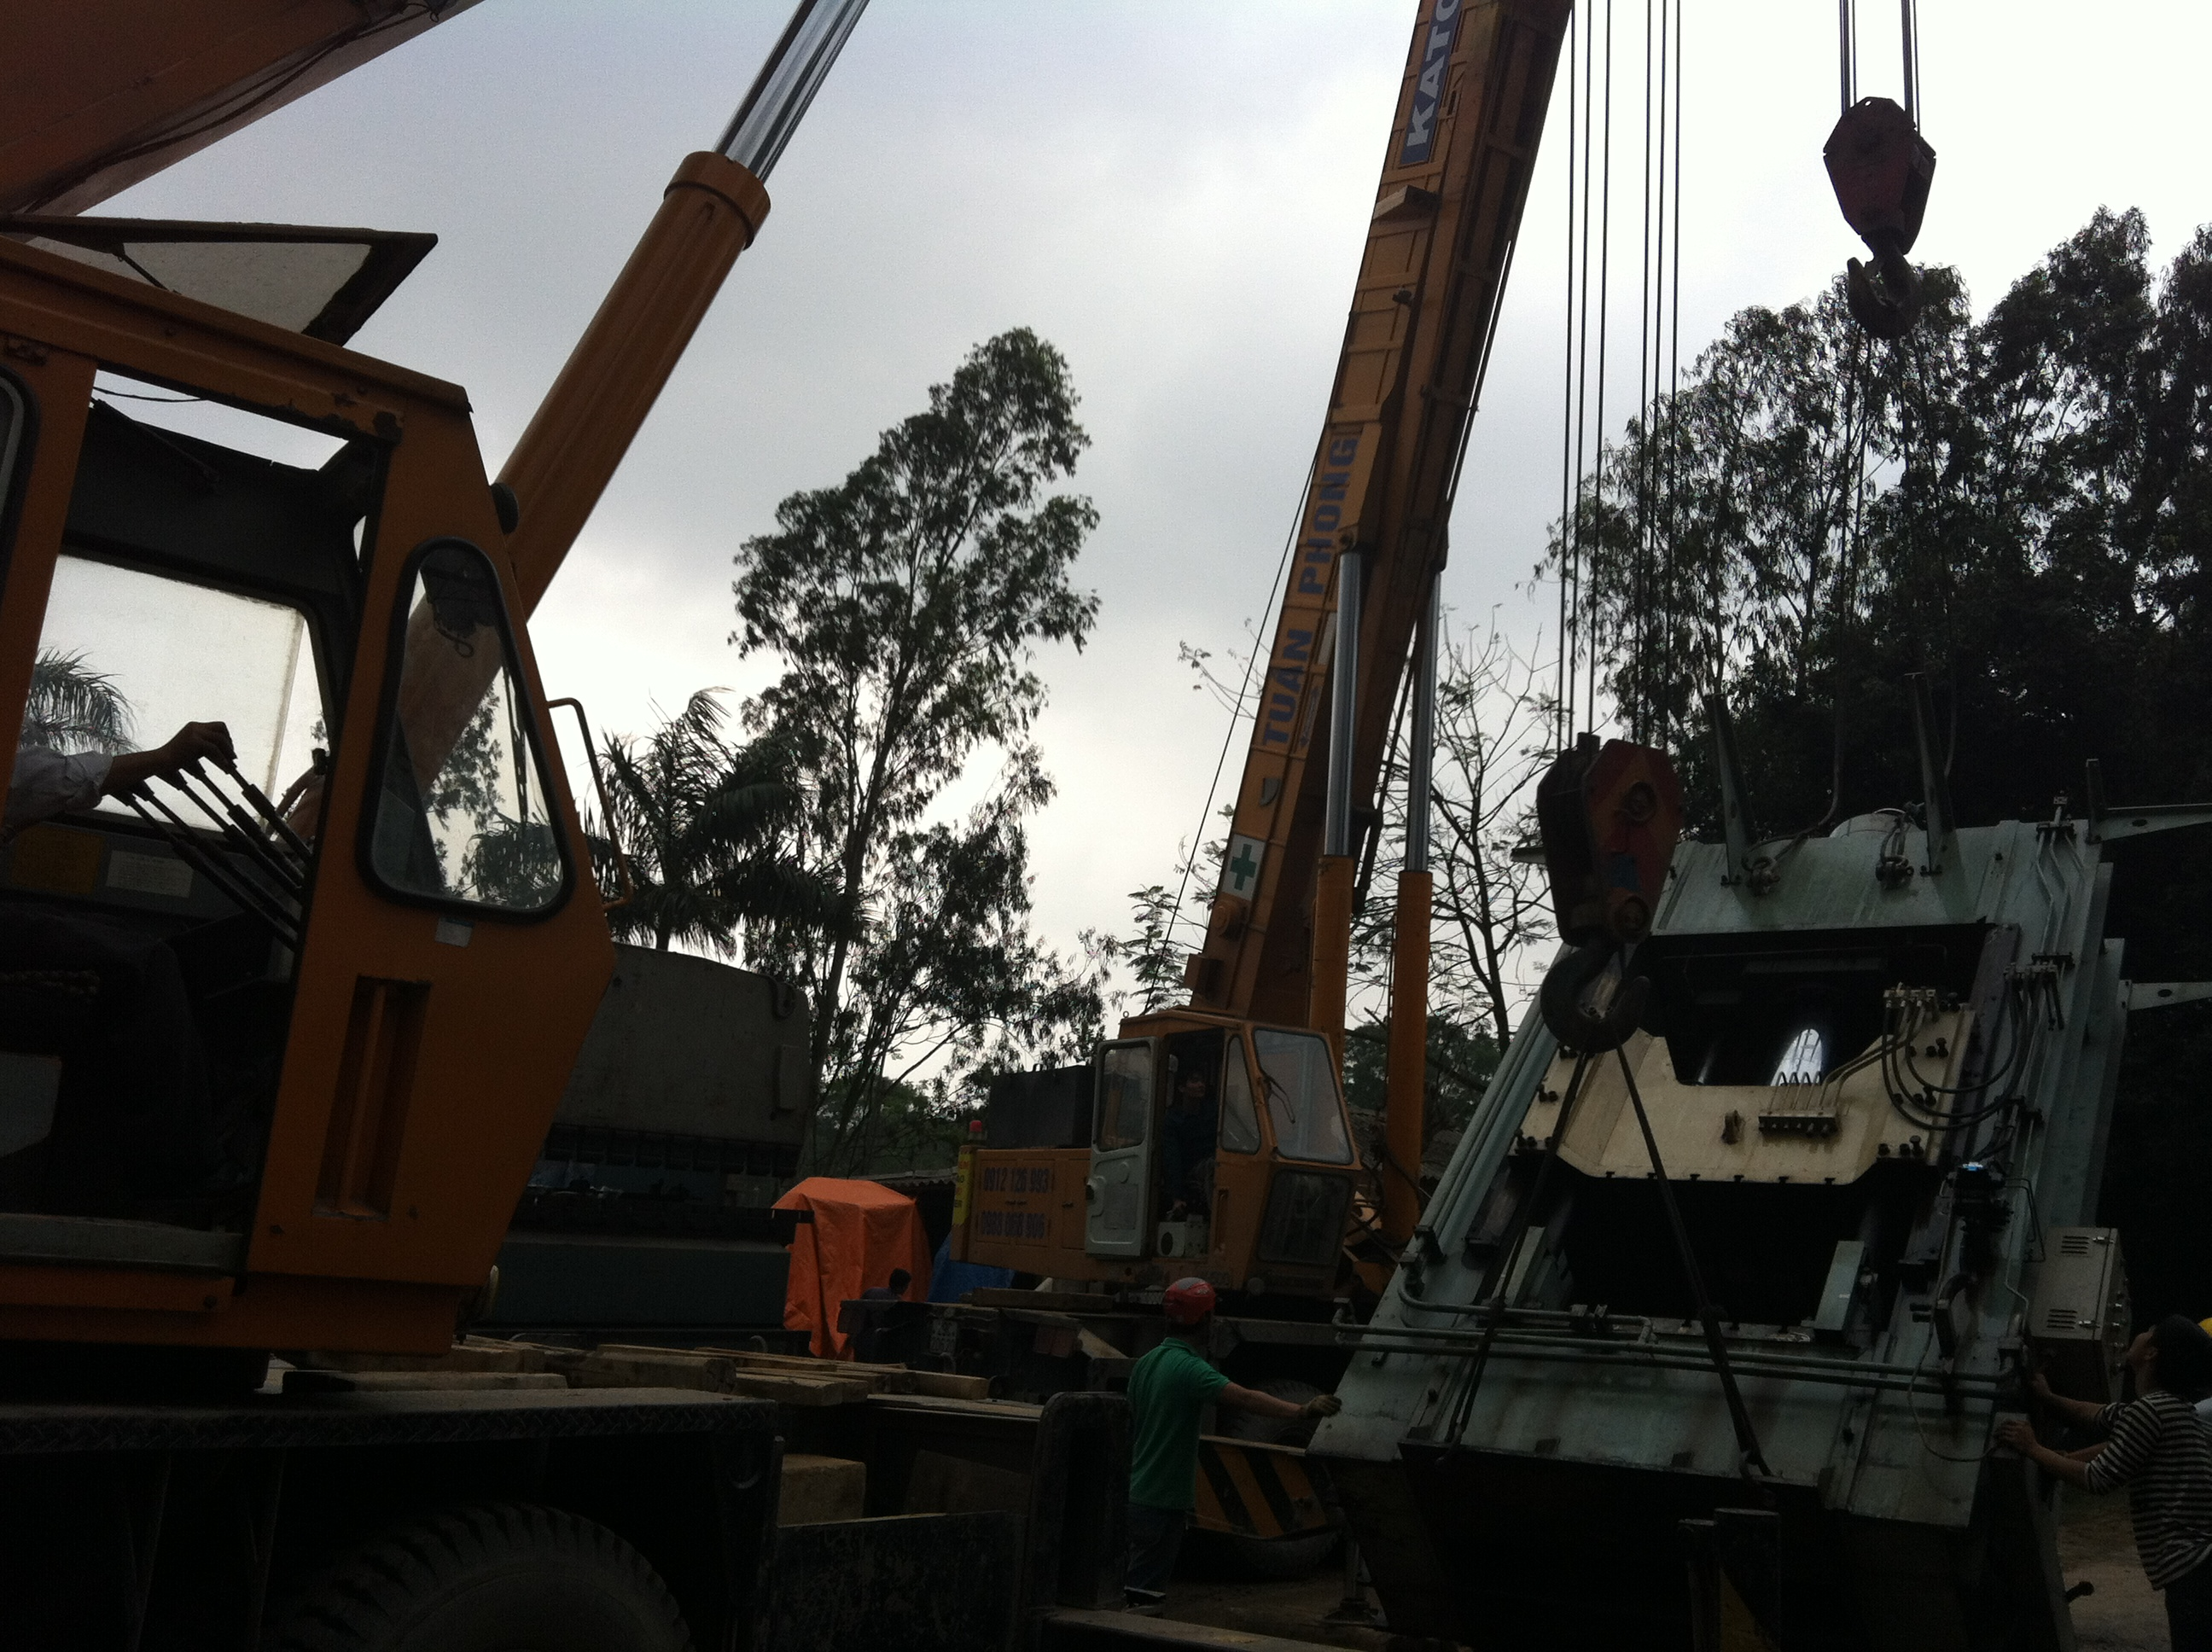 Cẩu KaTo 25 tấn, Cẩu KaTo 40 tấn - Cẩu KaTo  50 tấn 0912 126 993